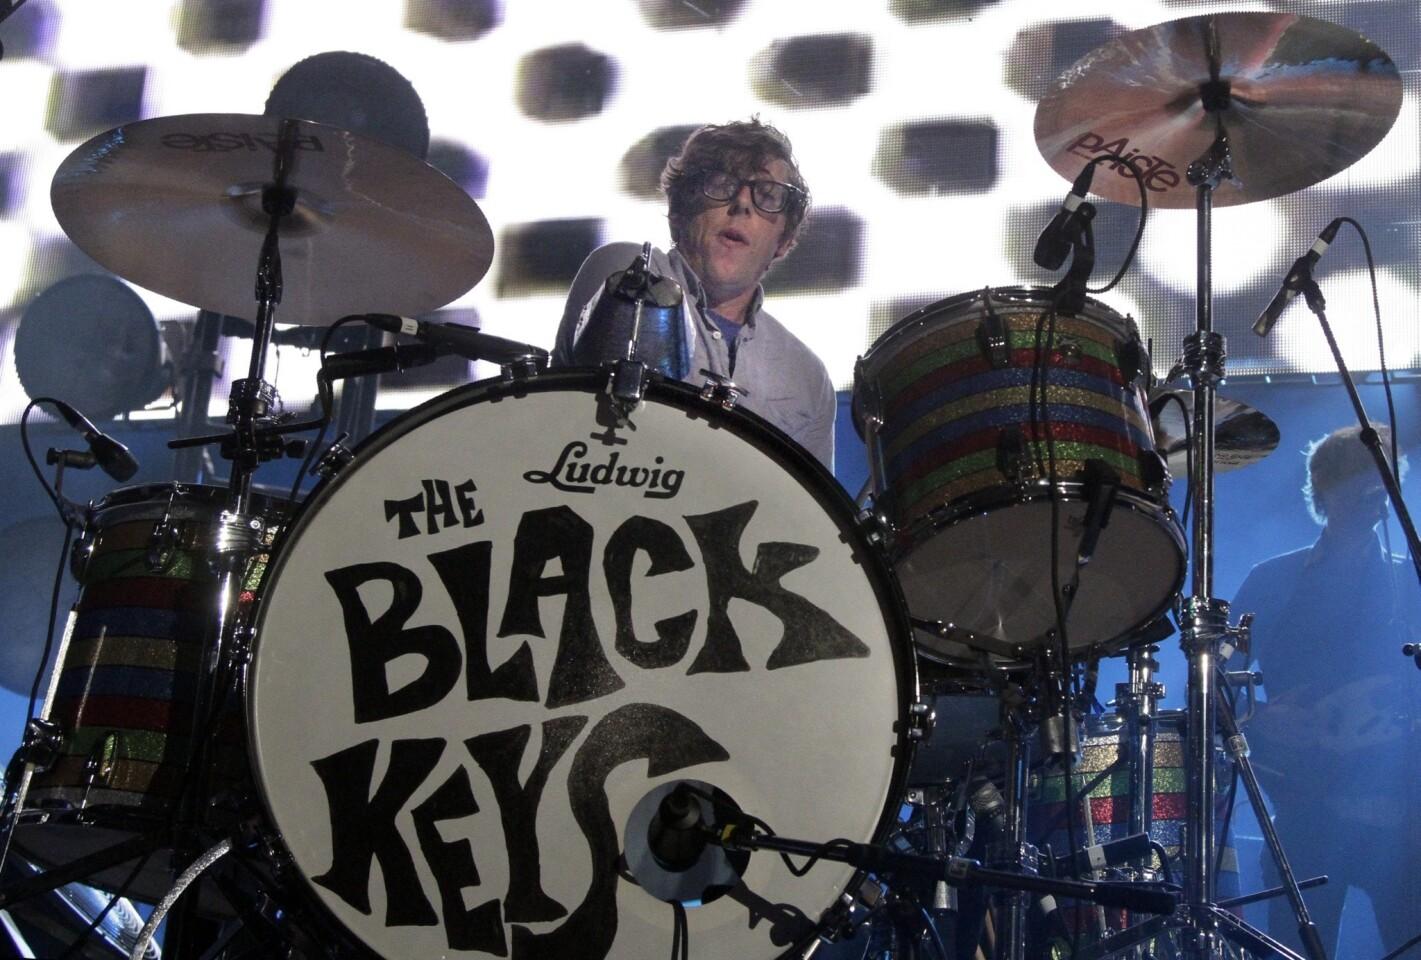 Patrick Carney of the Black Keys at KROQ's annual Weenie Roast.